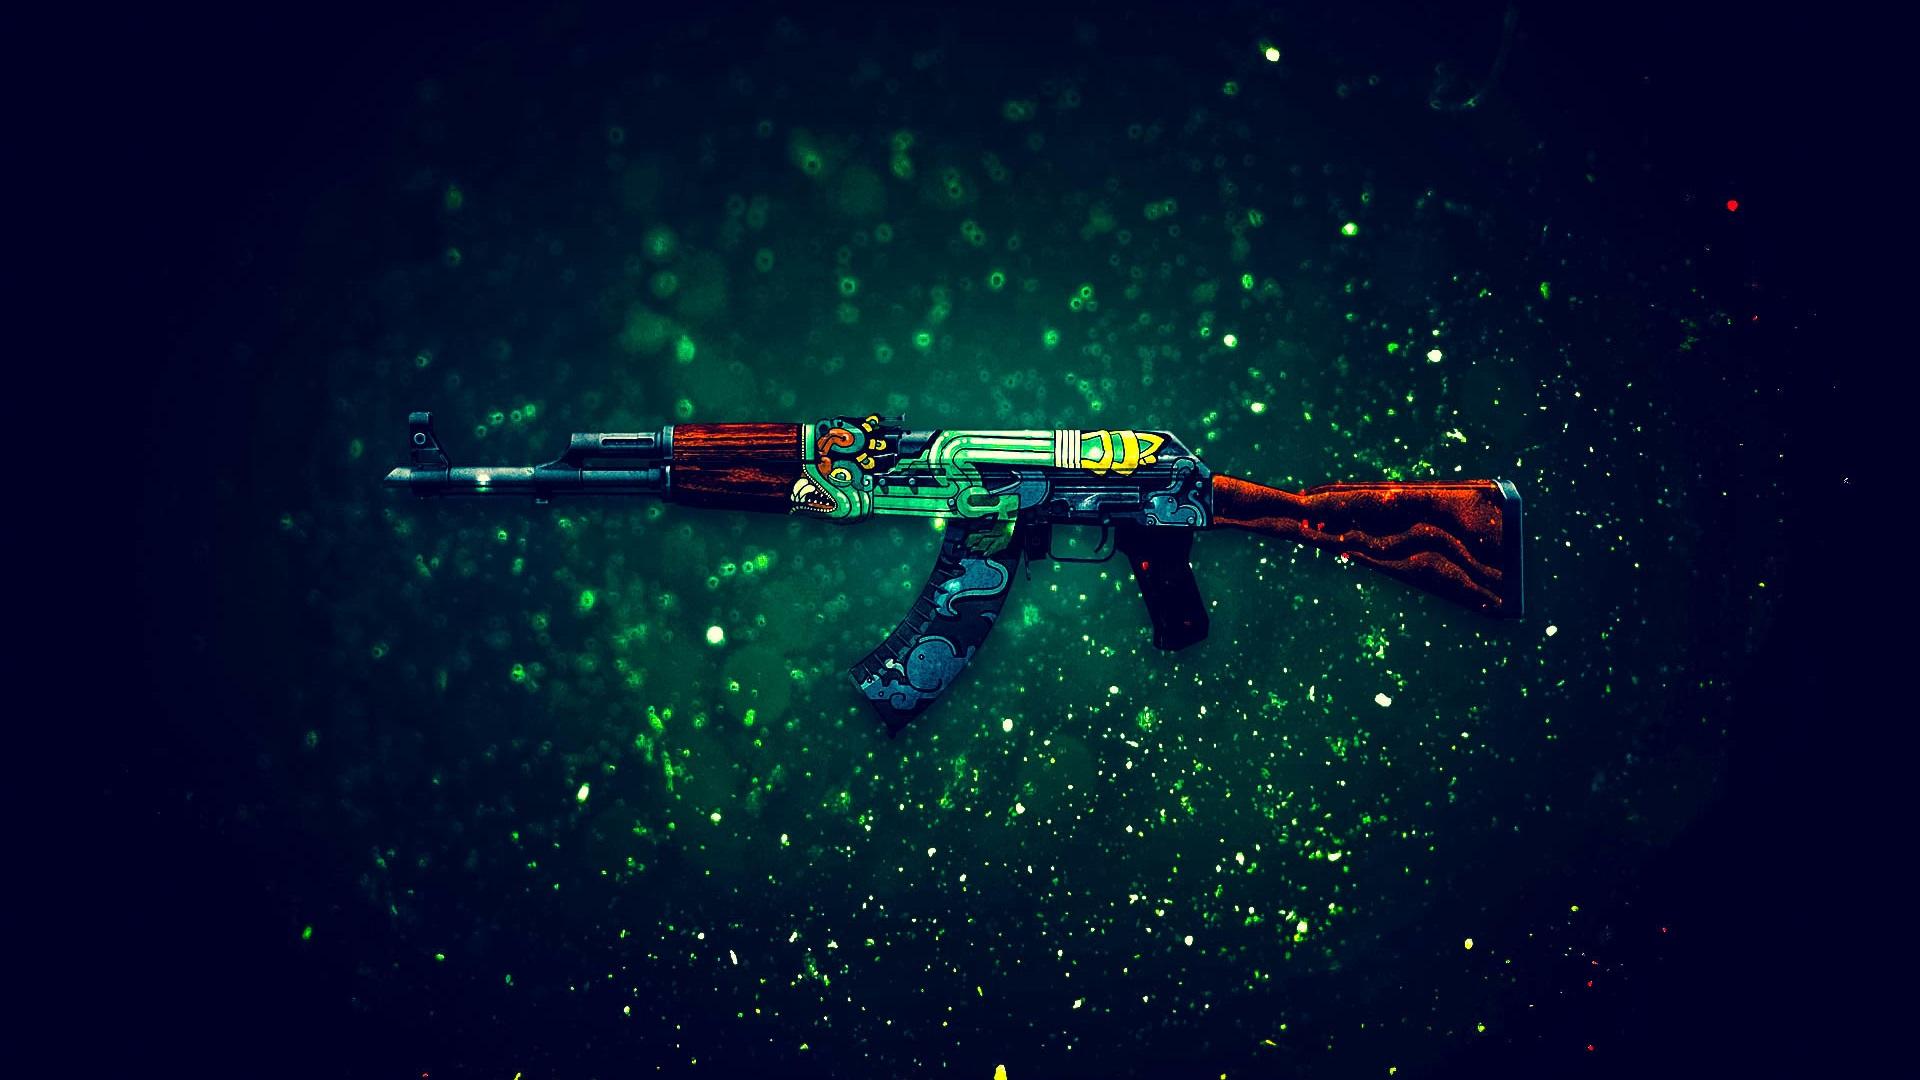 Cs Go Game Ak 47 Assault Rifle 640x1136 Iphone 5 5s 5c Se